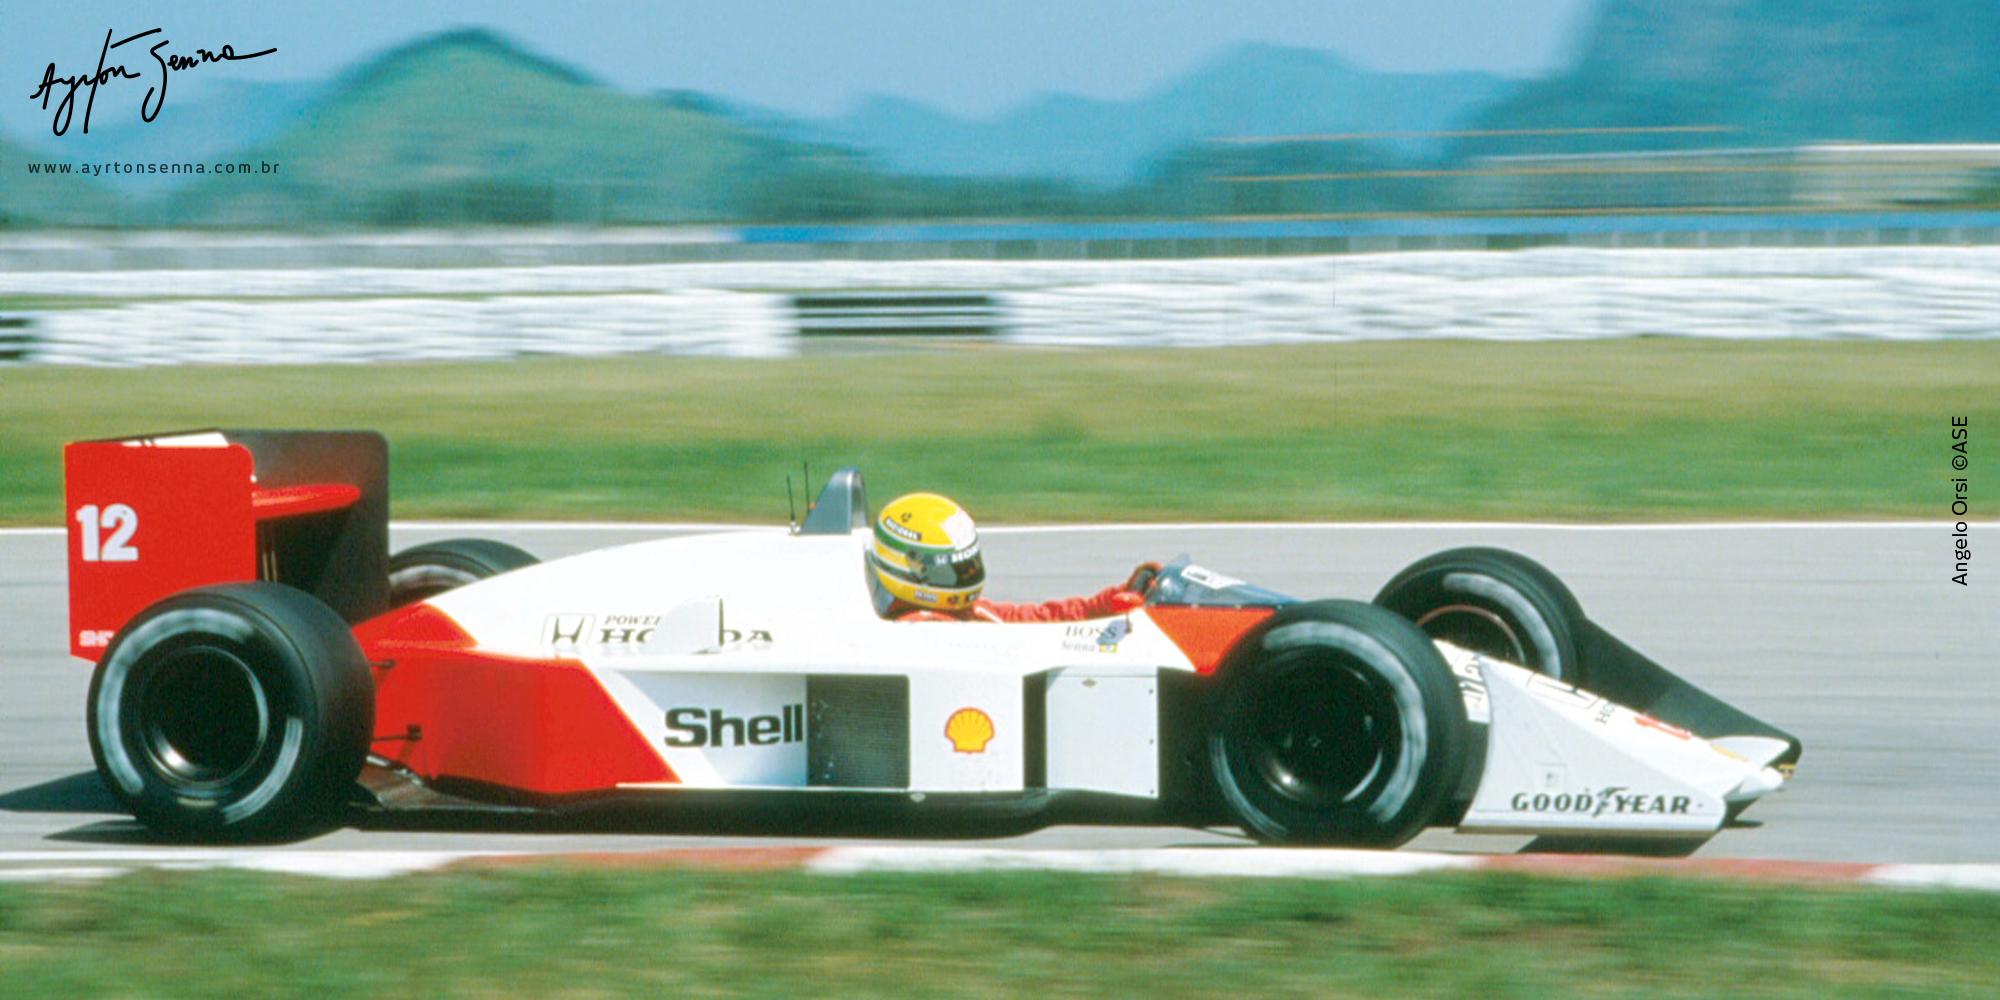 Brazilian Grand Prix 1988 The History Of Ayrton Senna